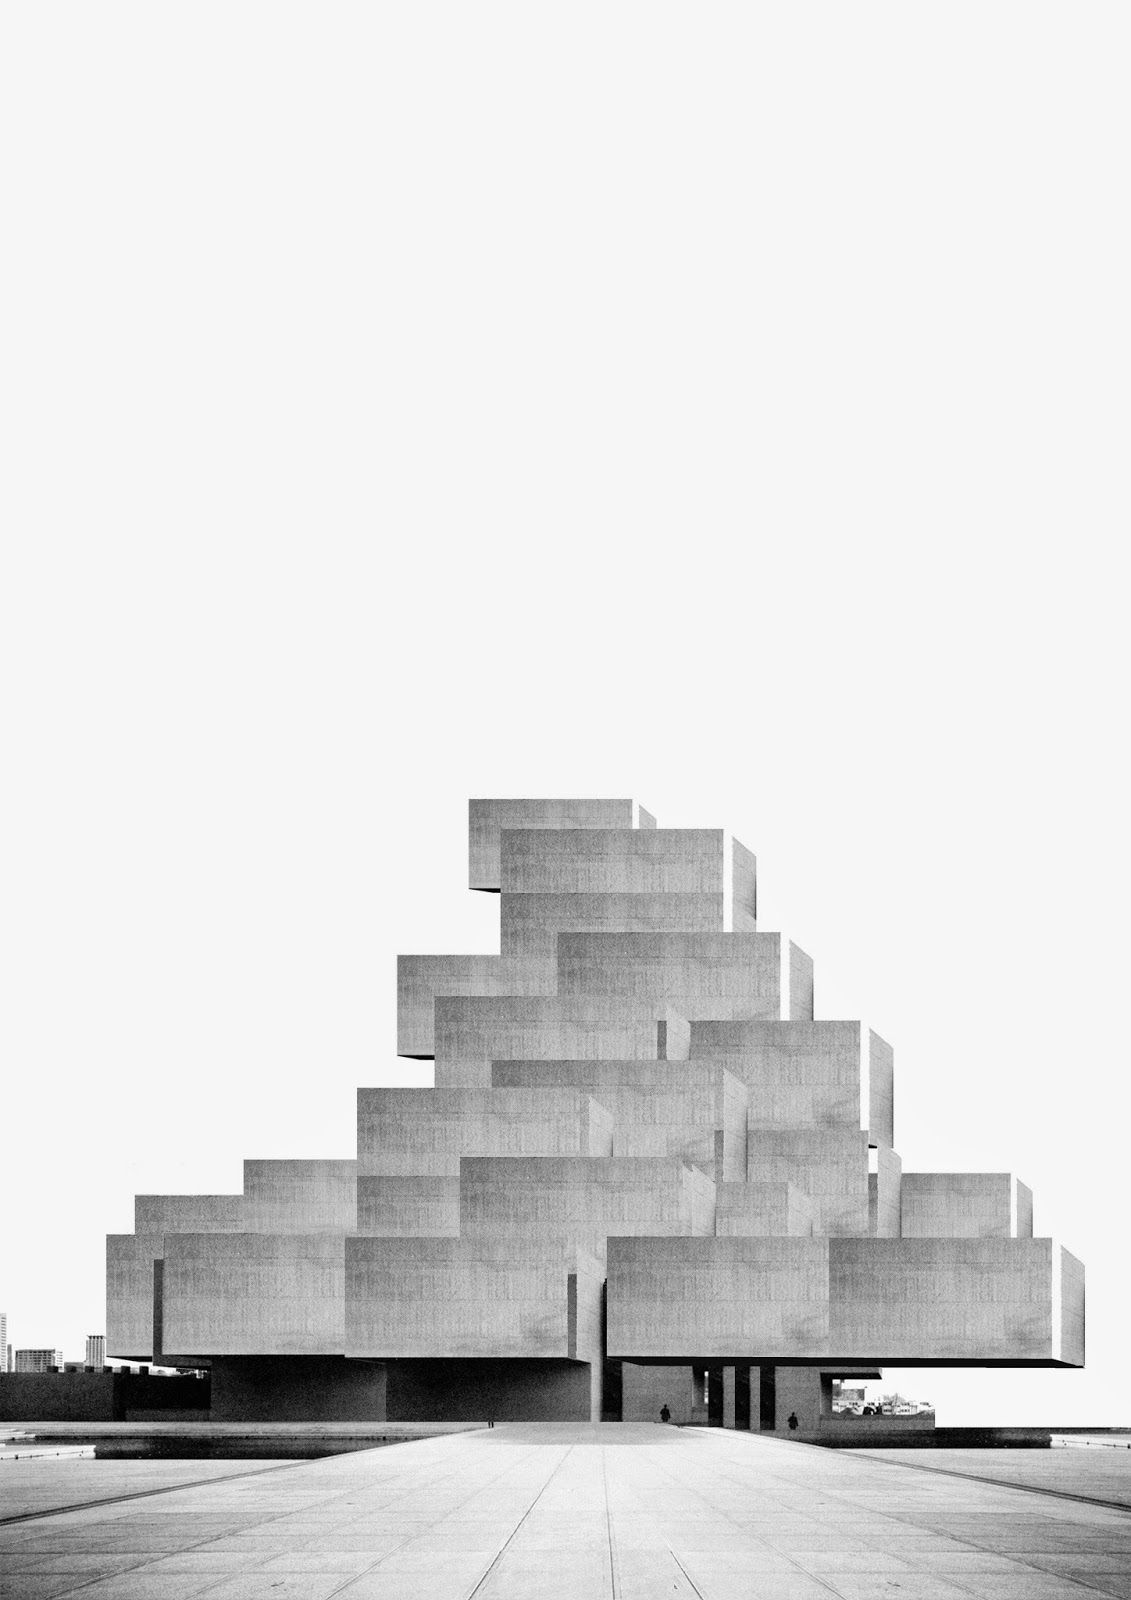 Pin By Ilya Nekrasov On Art Pinterest Architecture Cultural  # Muebles Lola Mora Bahia Blanca